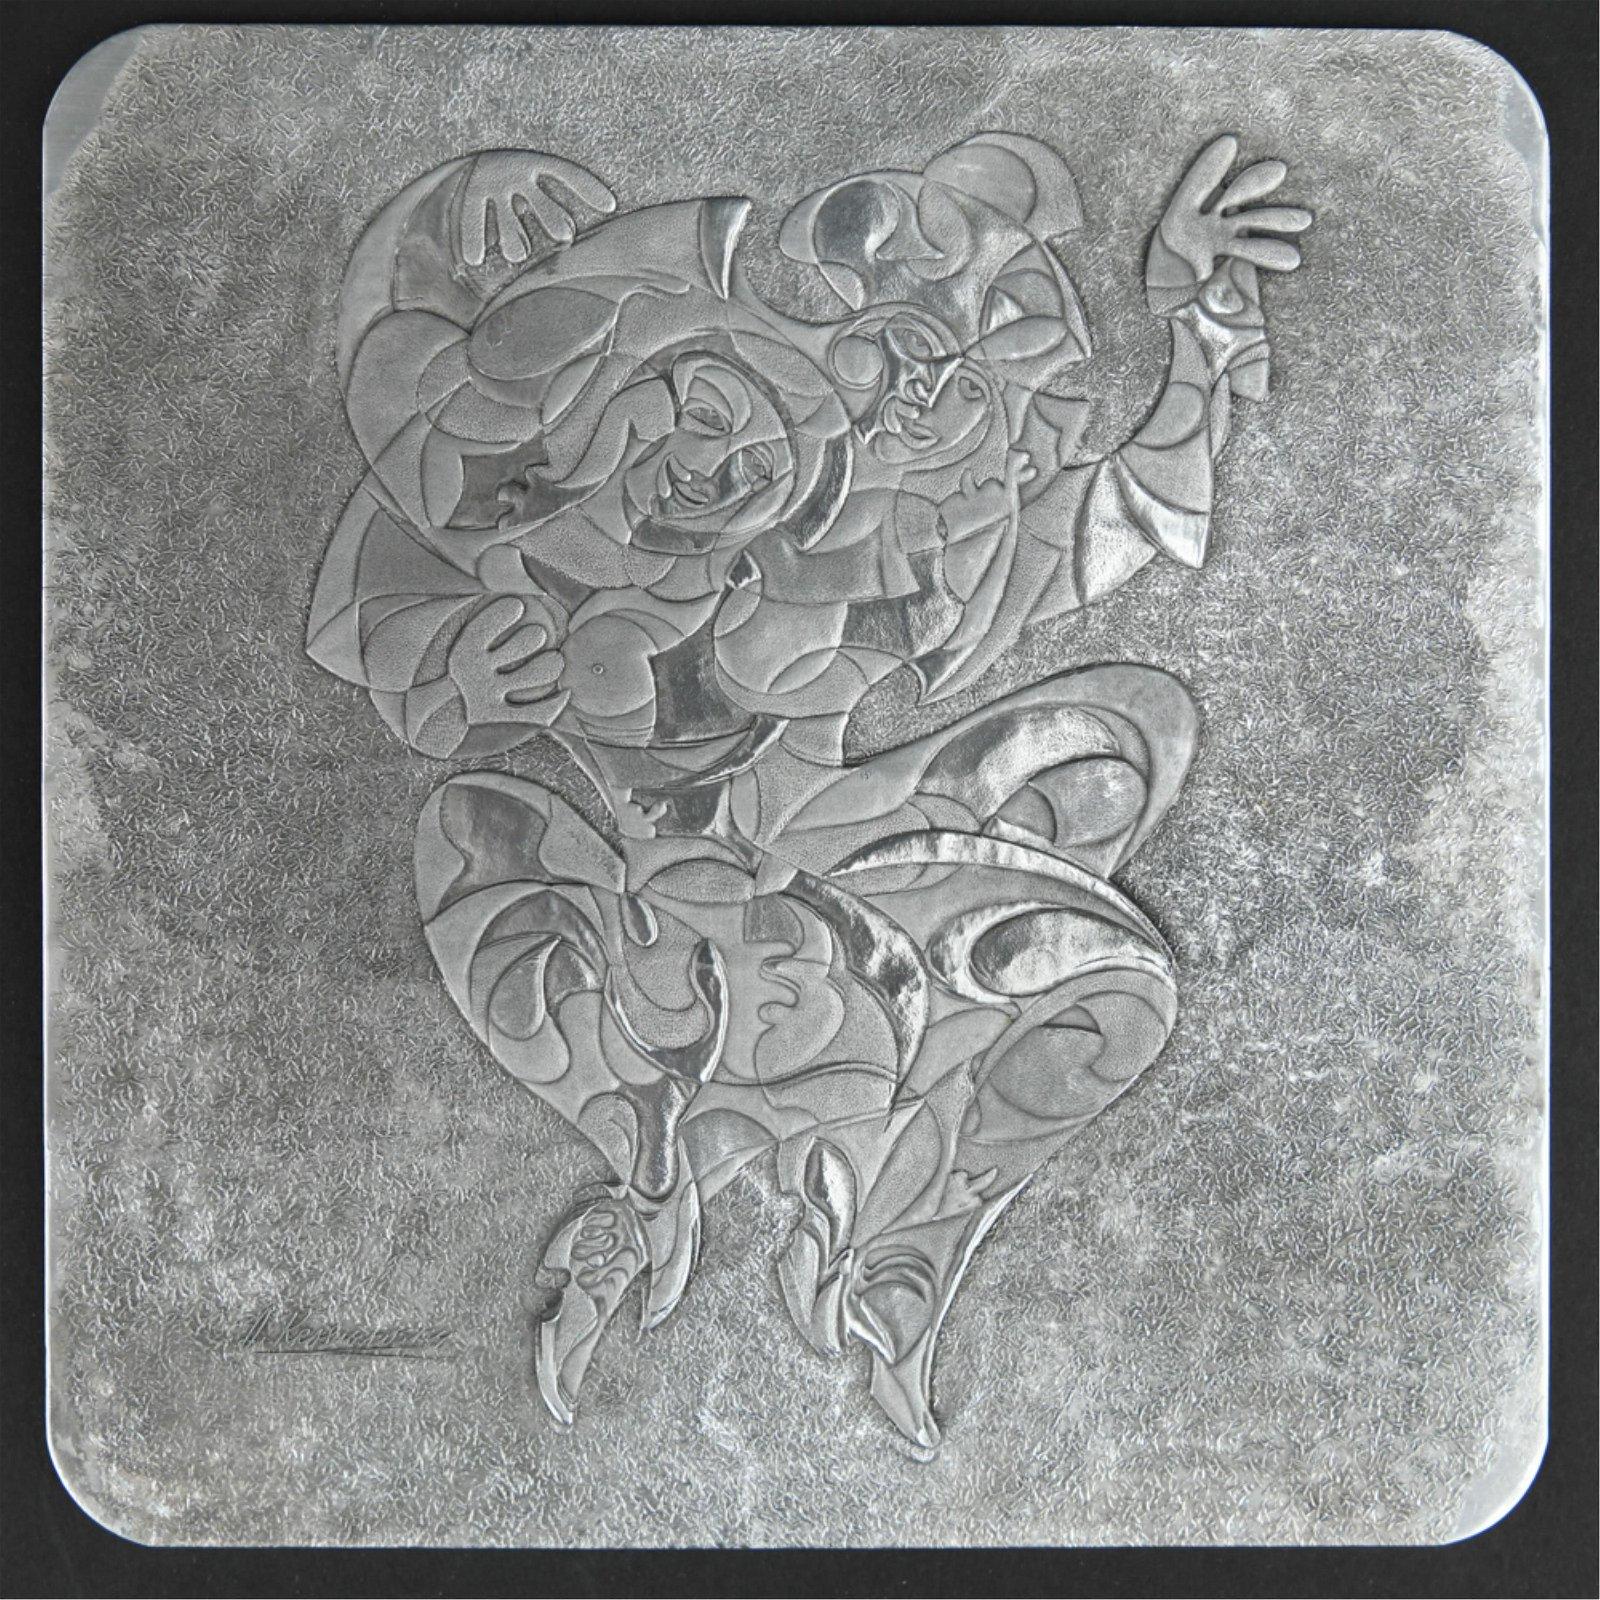 ANTOLE KRASNYANSKY LIMITED EDITION METAL PLAQUE